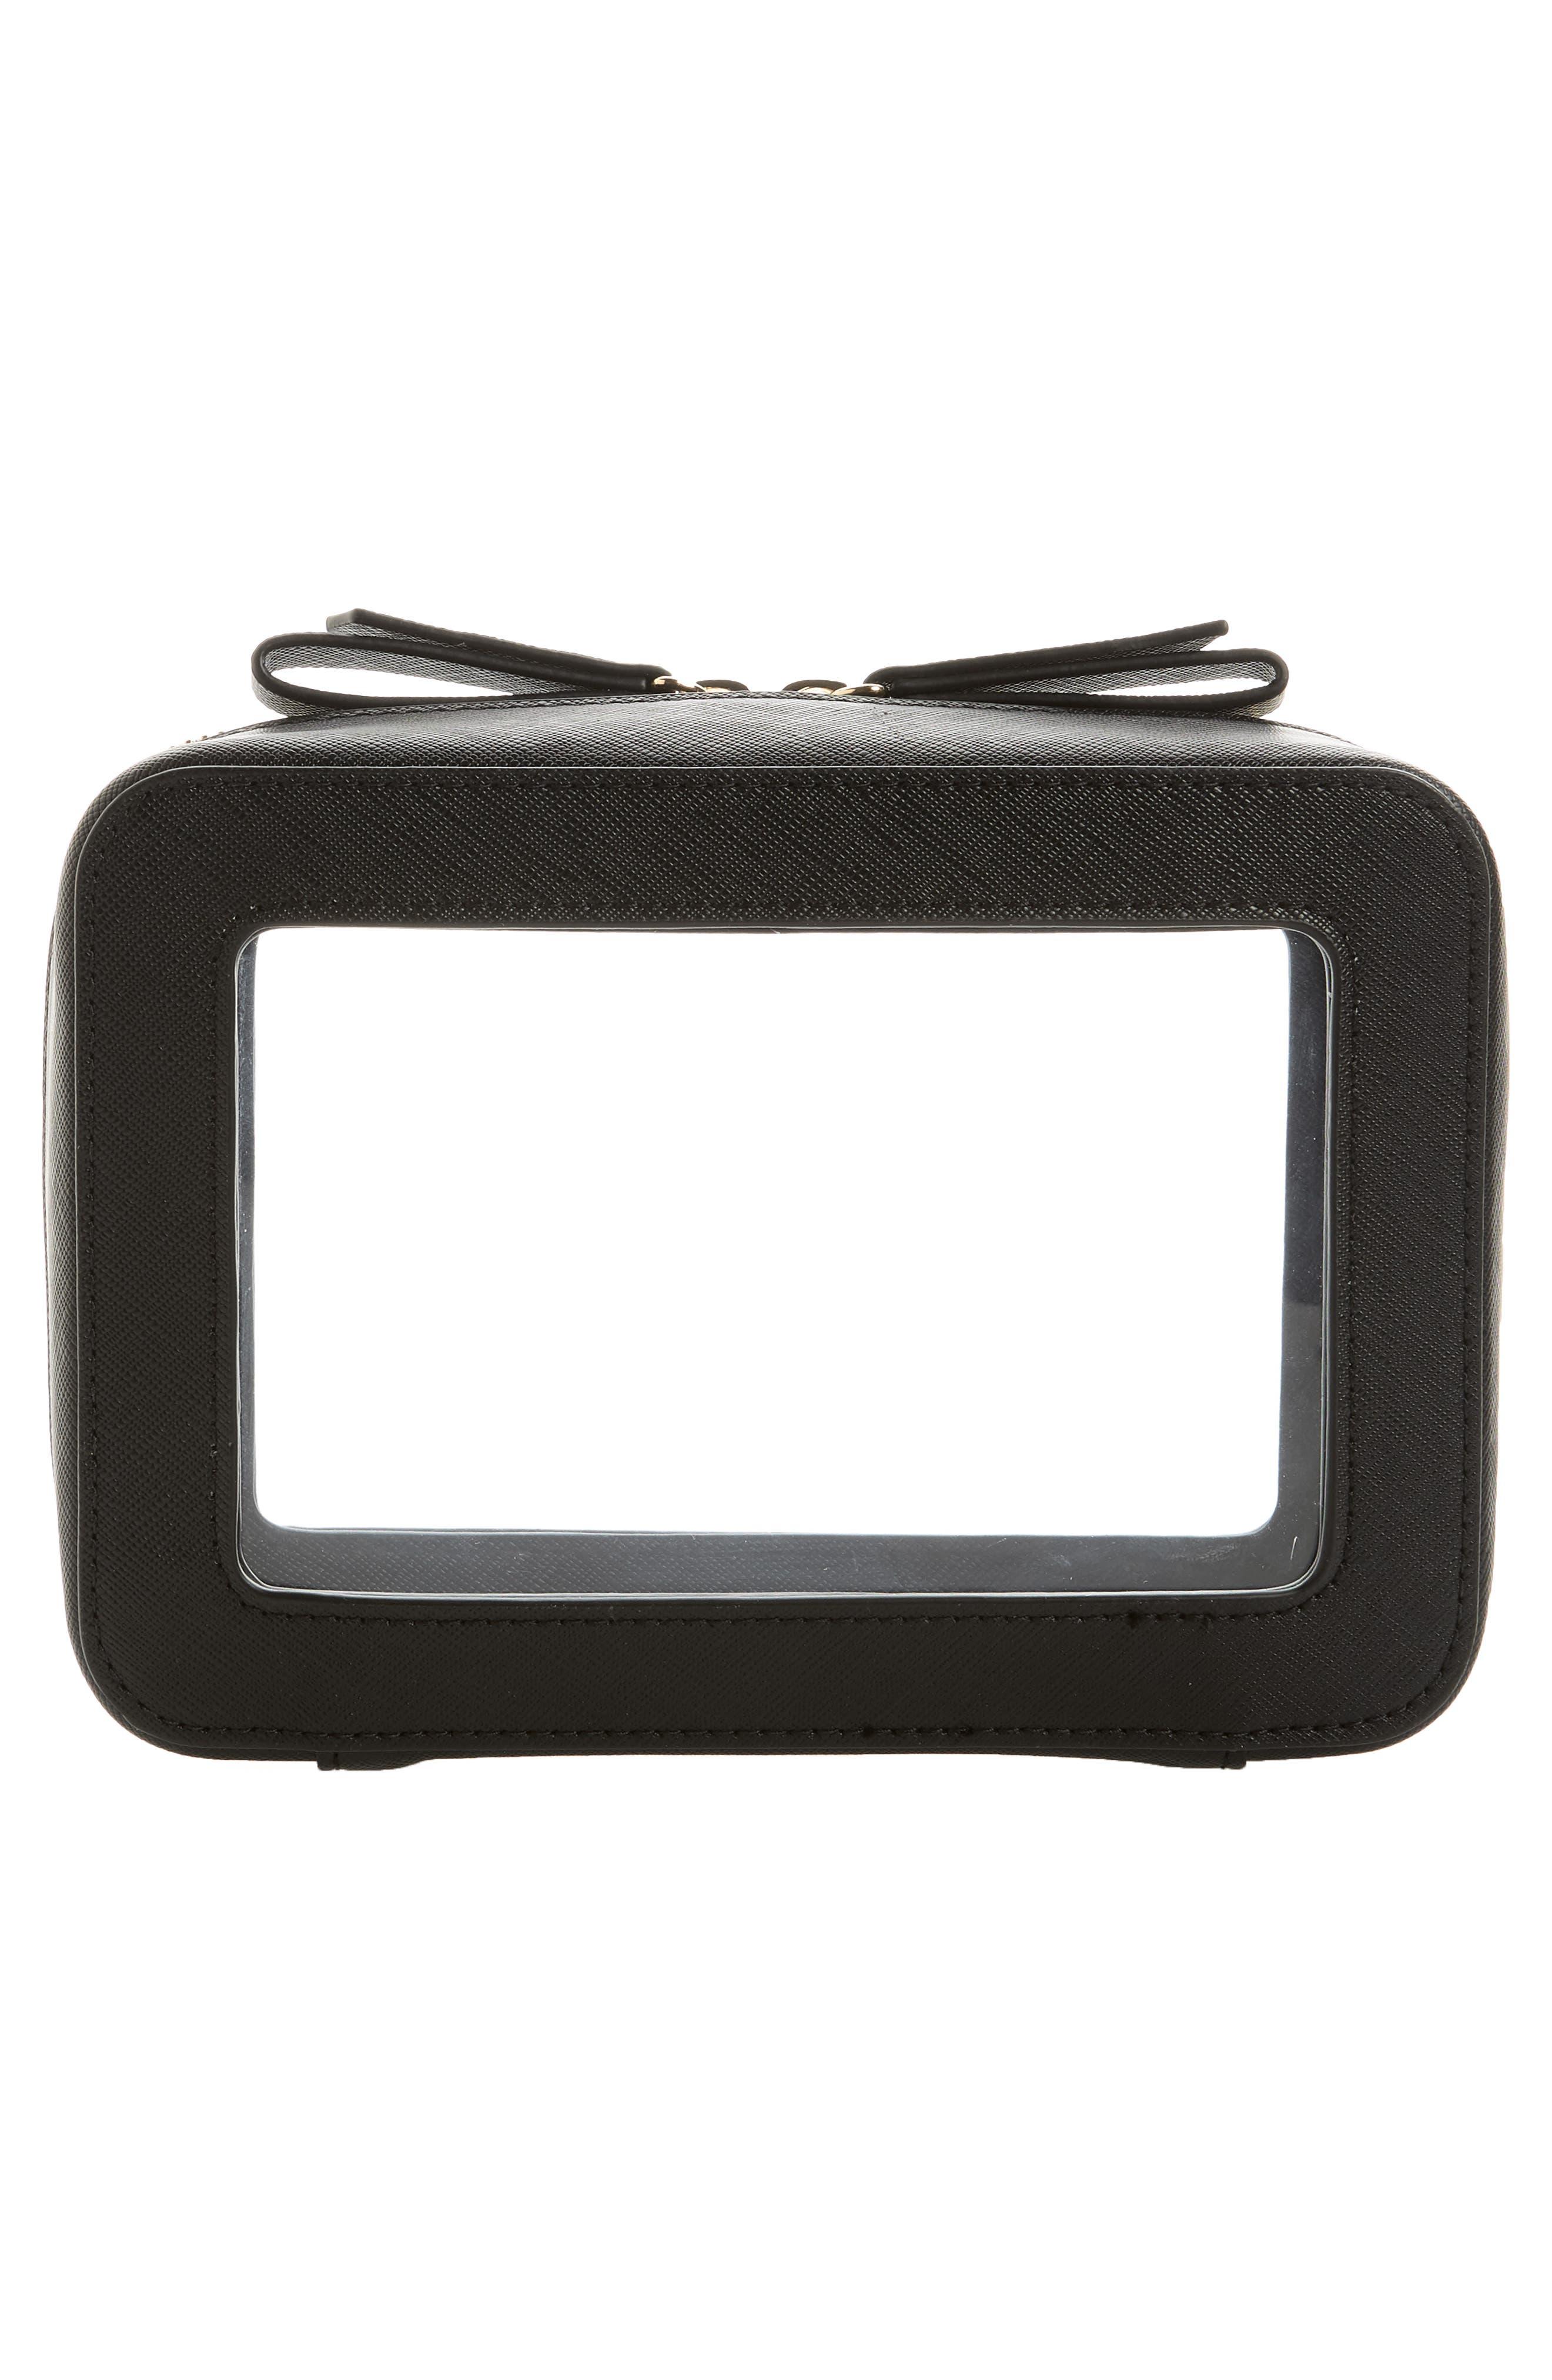 TRUFFLE, Clarity Jetset Cosmetics Case, Alternate thumbnail 5, color, BLACK